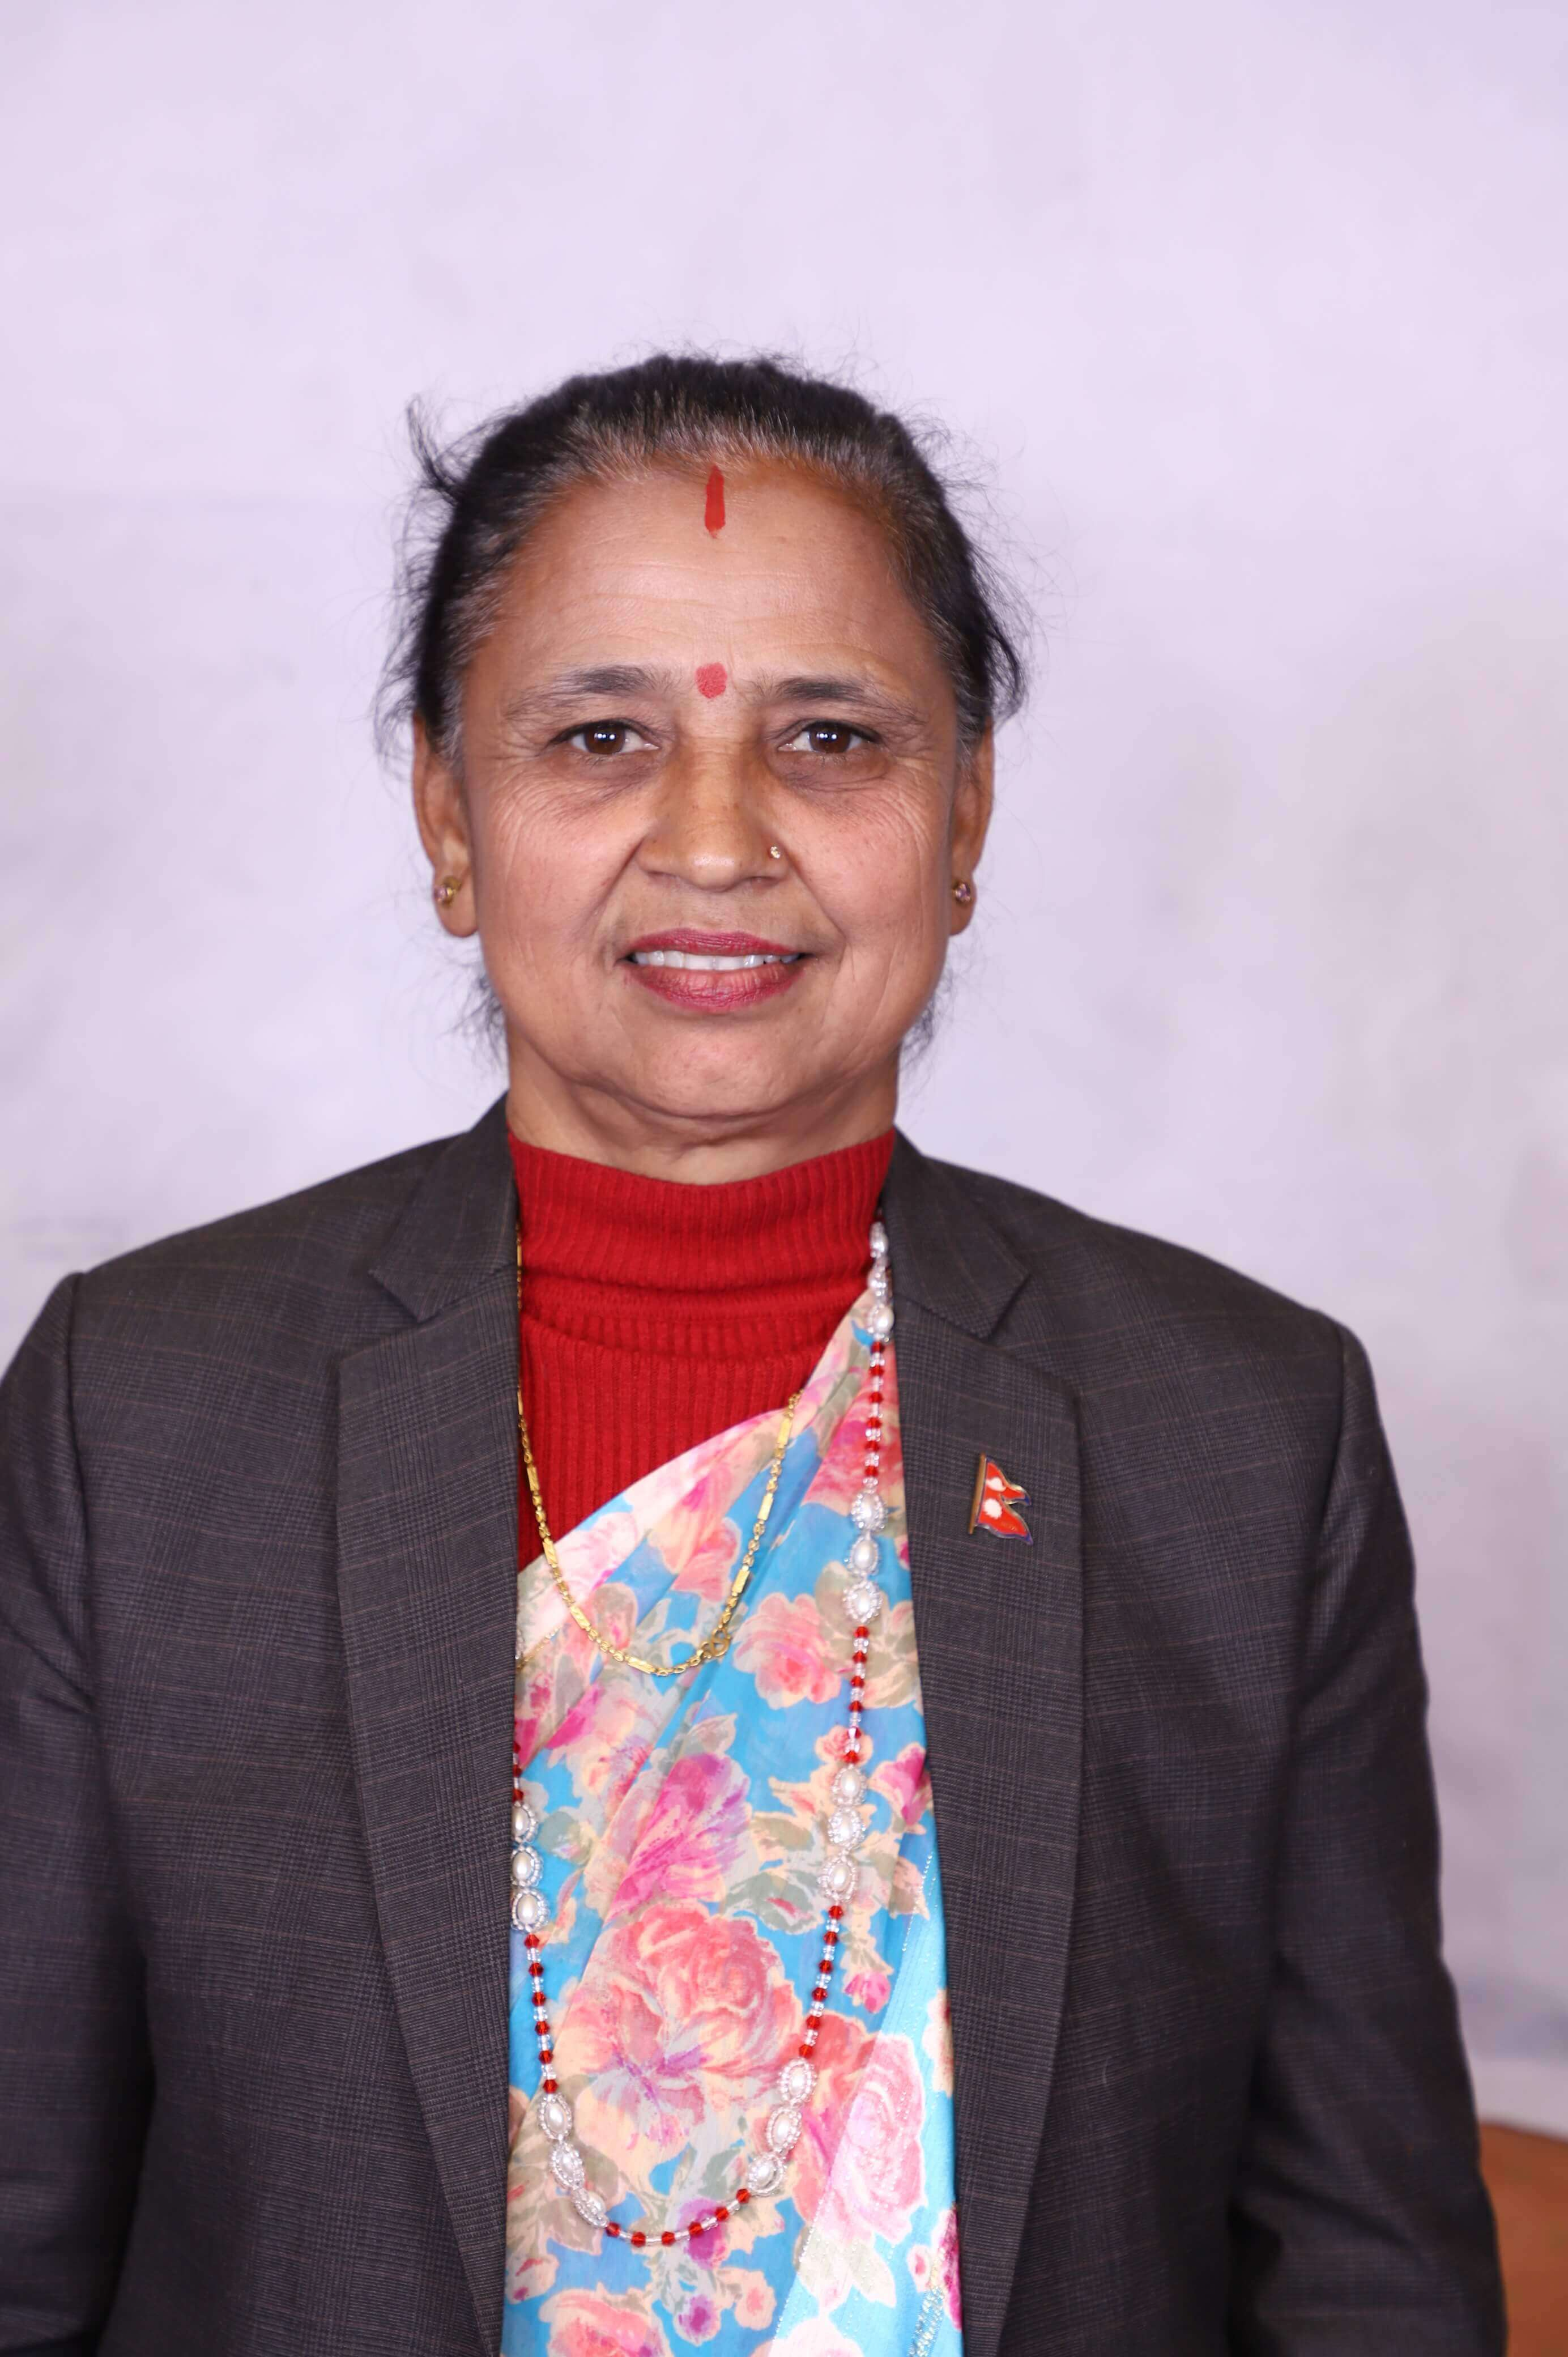 Ms. Mandra Mishra